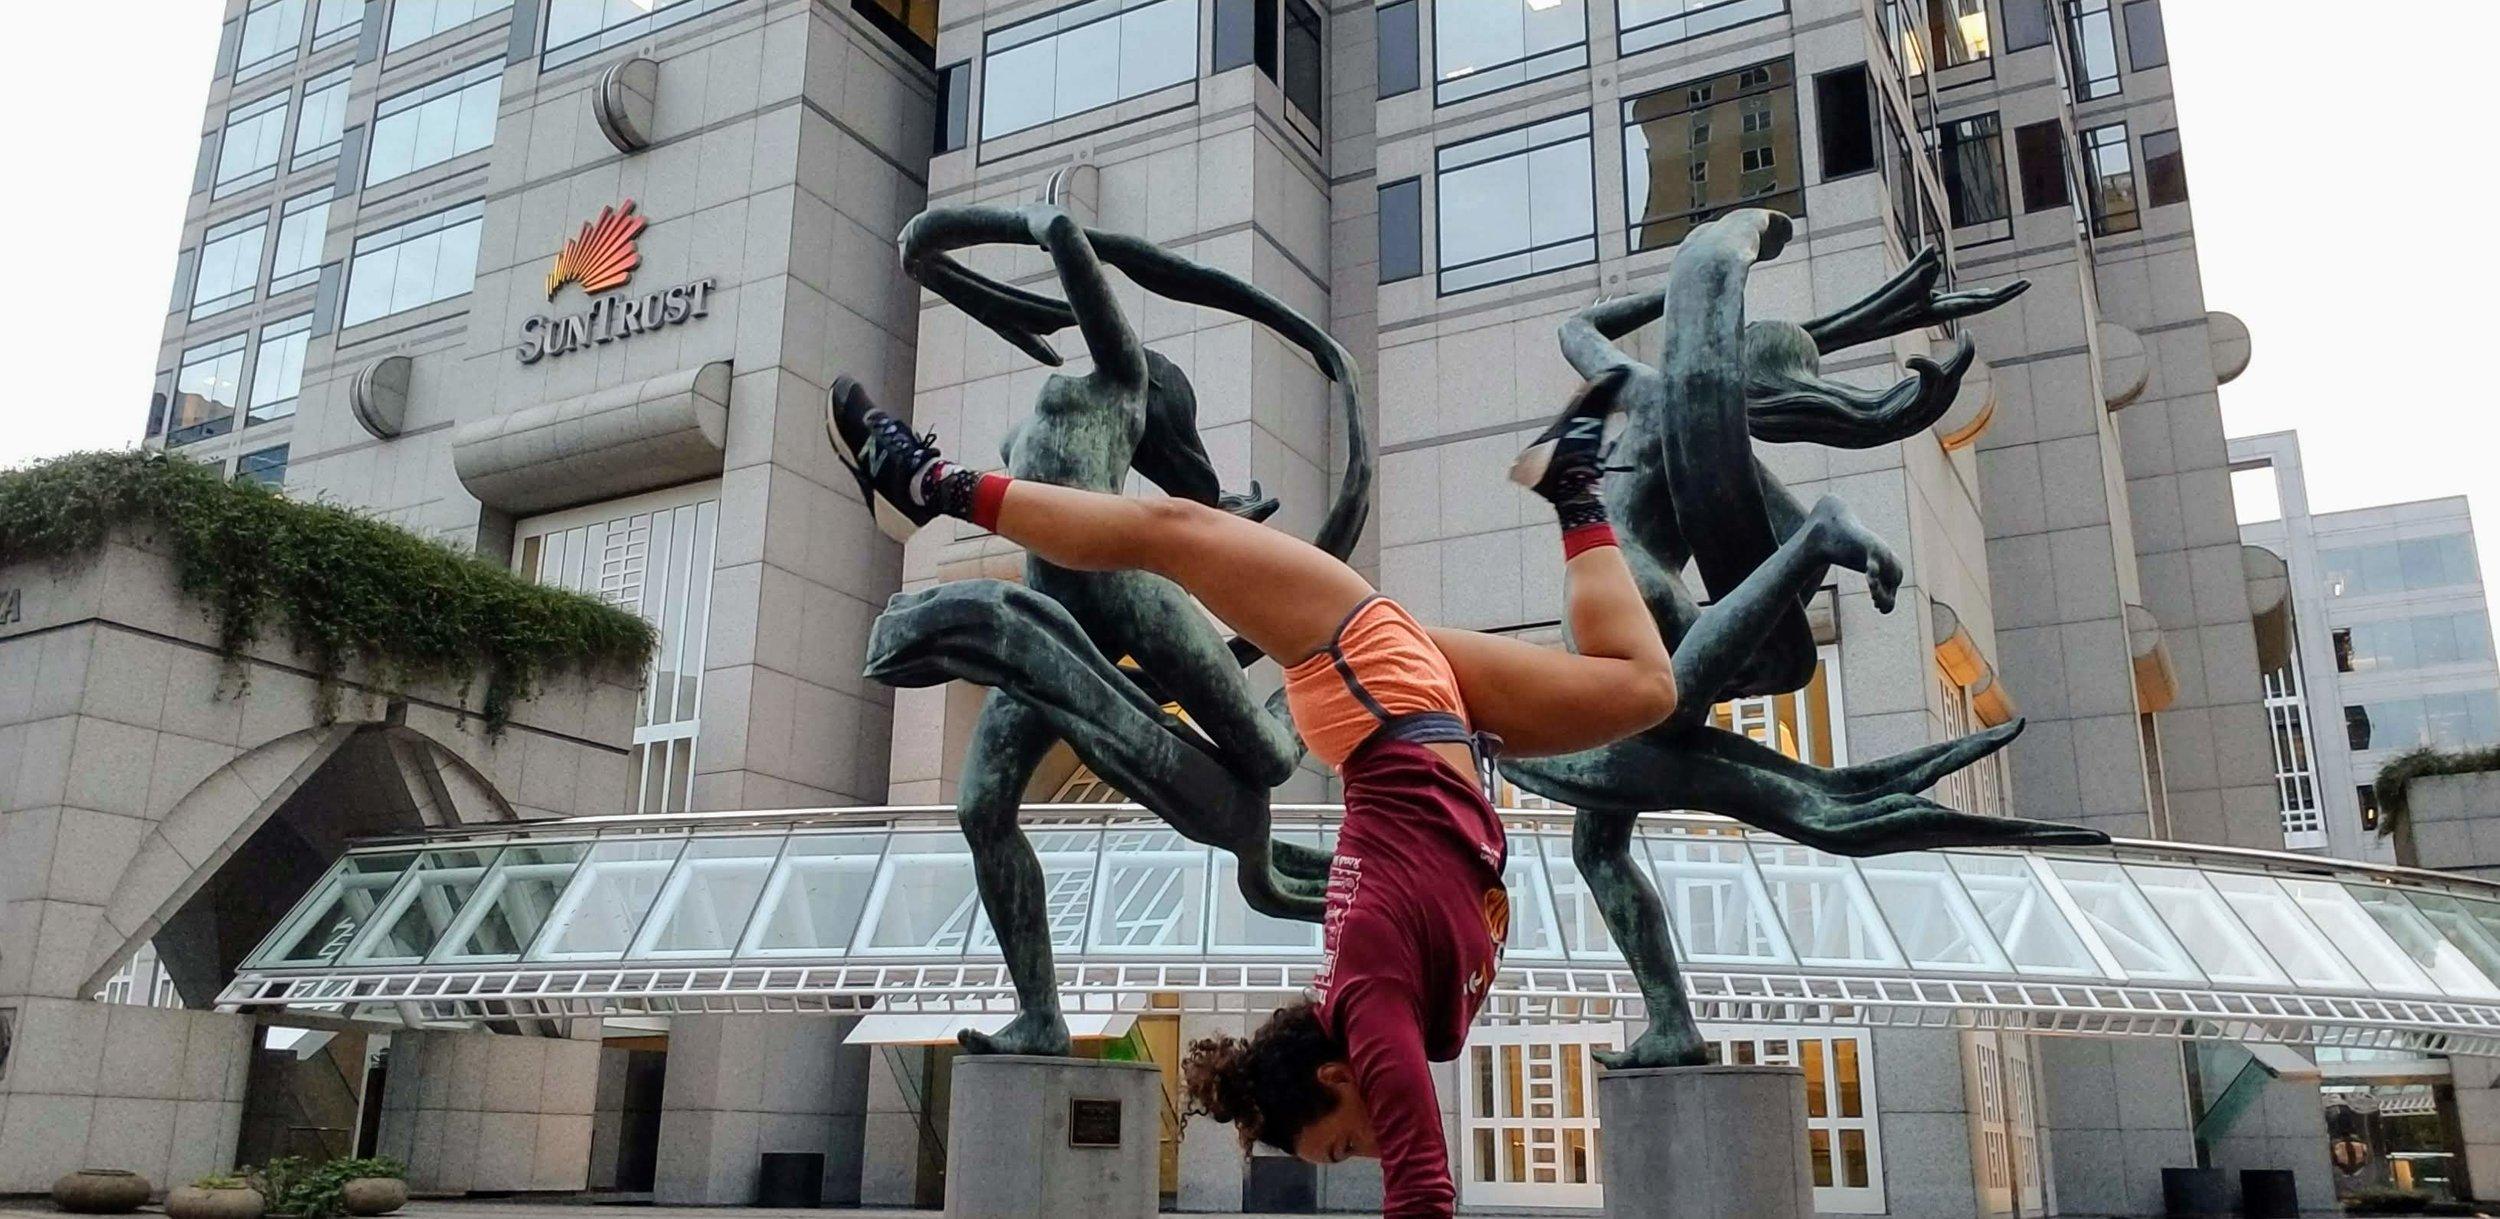 spontaneous handstands during a run in downtown Atlanta, GA